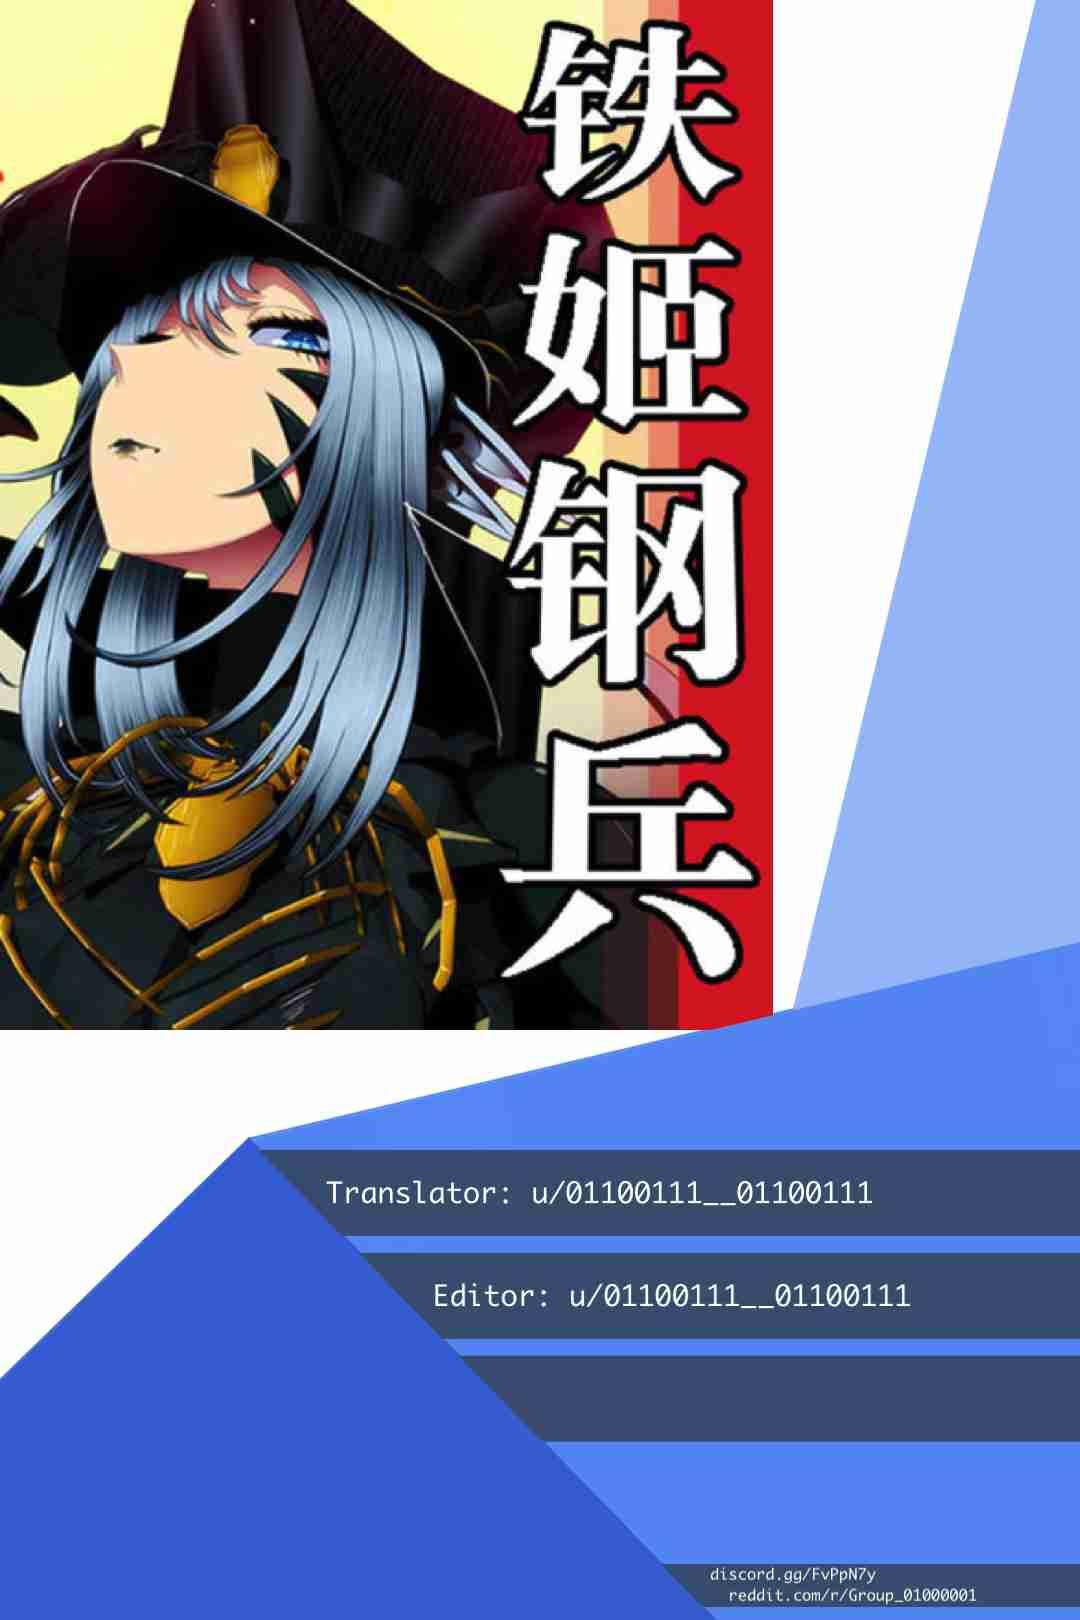 https://manga.mangadogs.com/comics/pic2/59/24443/741747/b8eadb229854b2add23d0371cc31b937.jpg Page 1